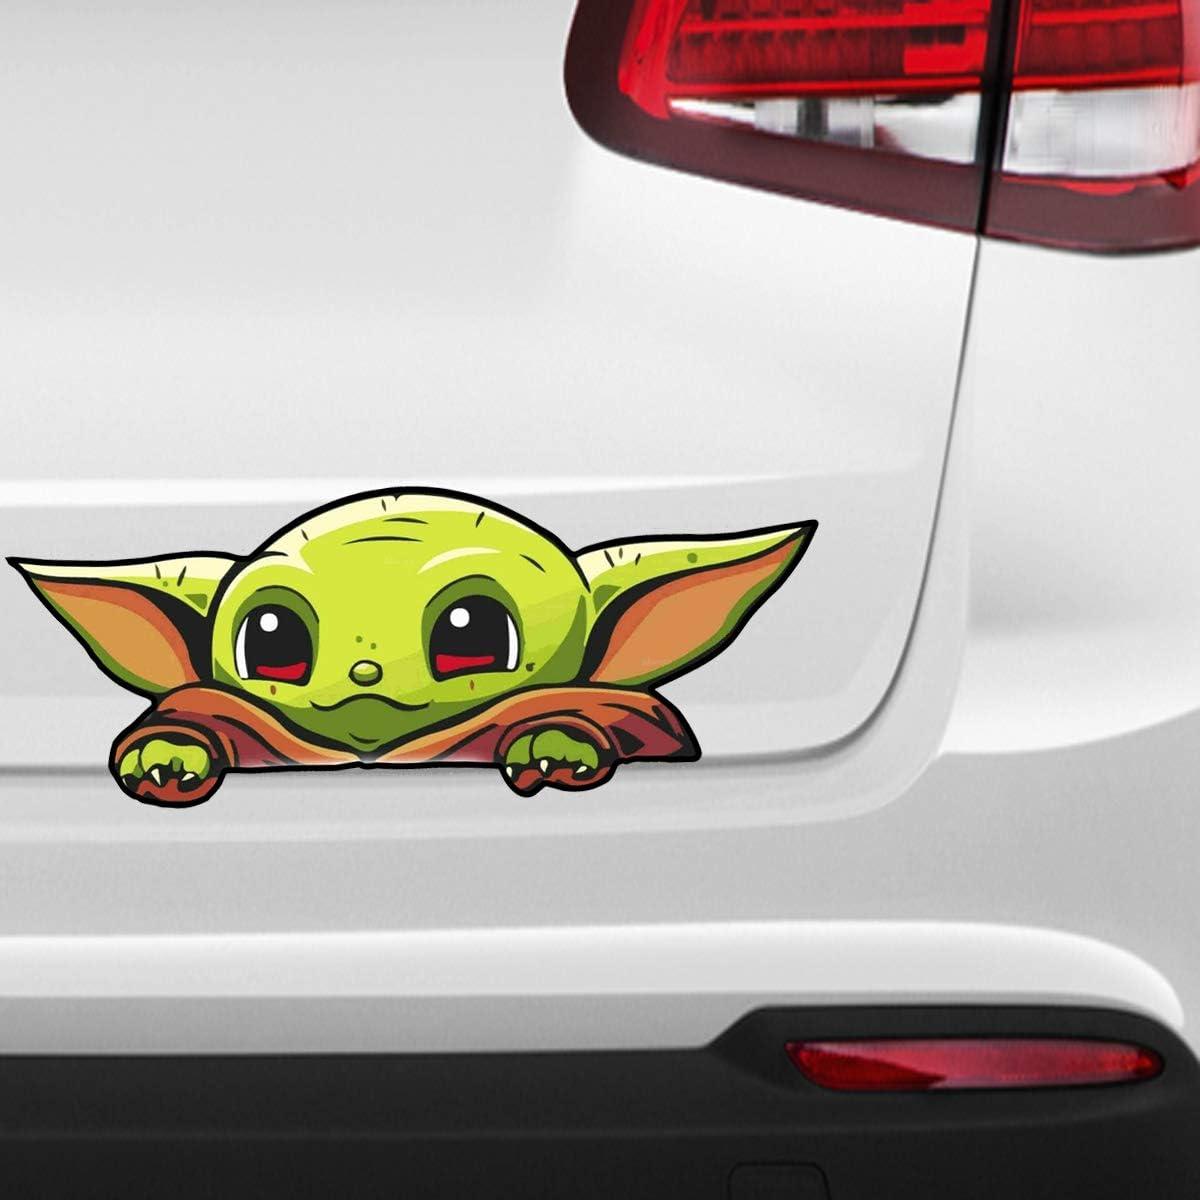 Pro Cut Graphics 1 X Baby Yoda Peeking Car Sticker Vinyl Decal Window Bumper Van Laptop Ipad Car Window 15cm Full Colour Print Amazon Co Uk Diy Tools